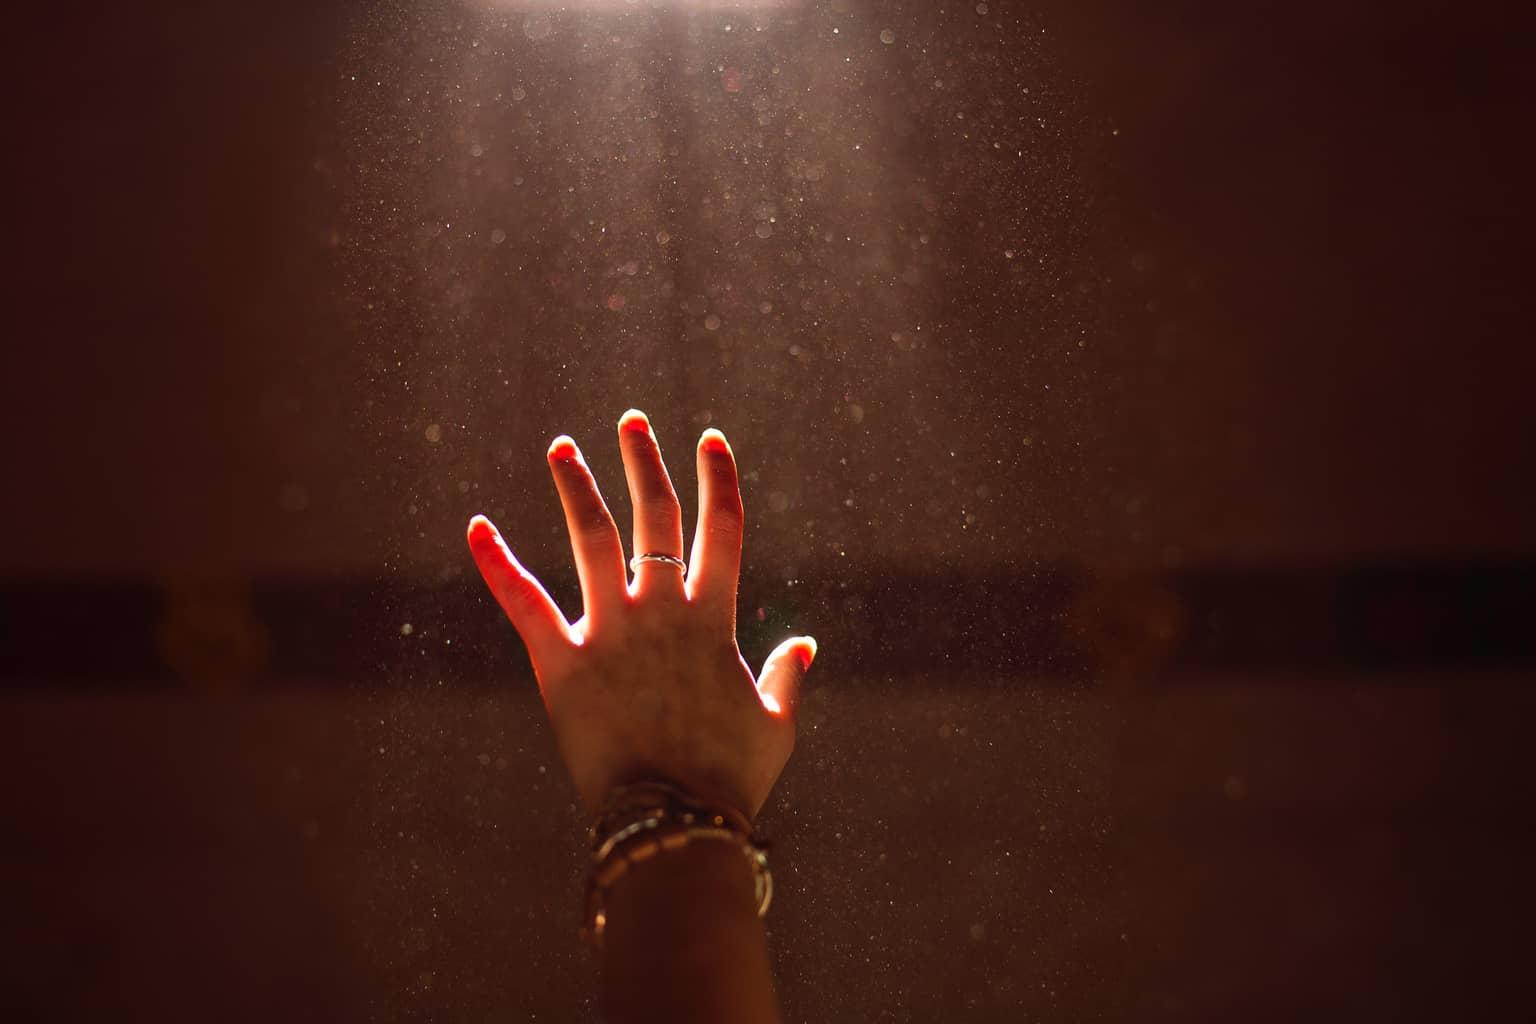 worship hand reaching up towards light